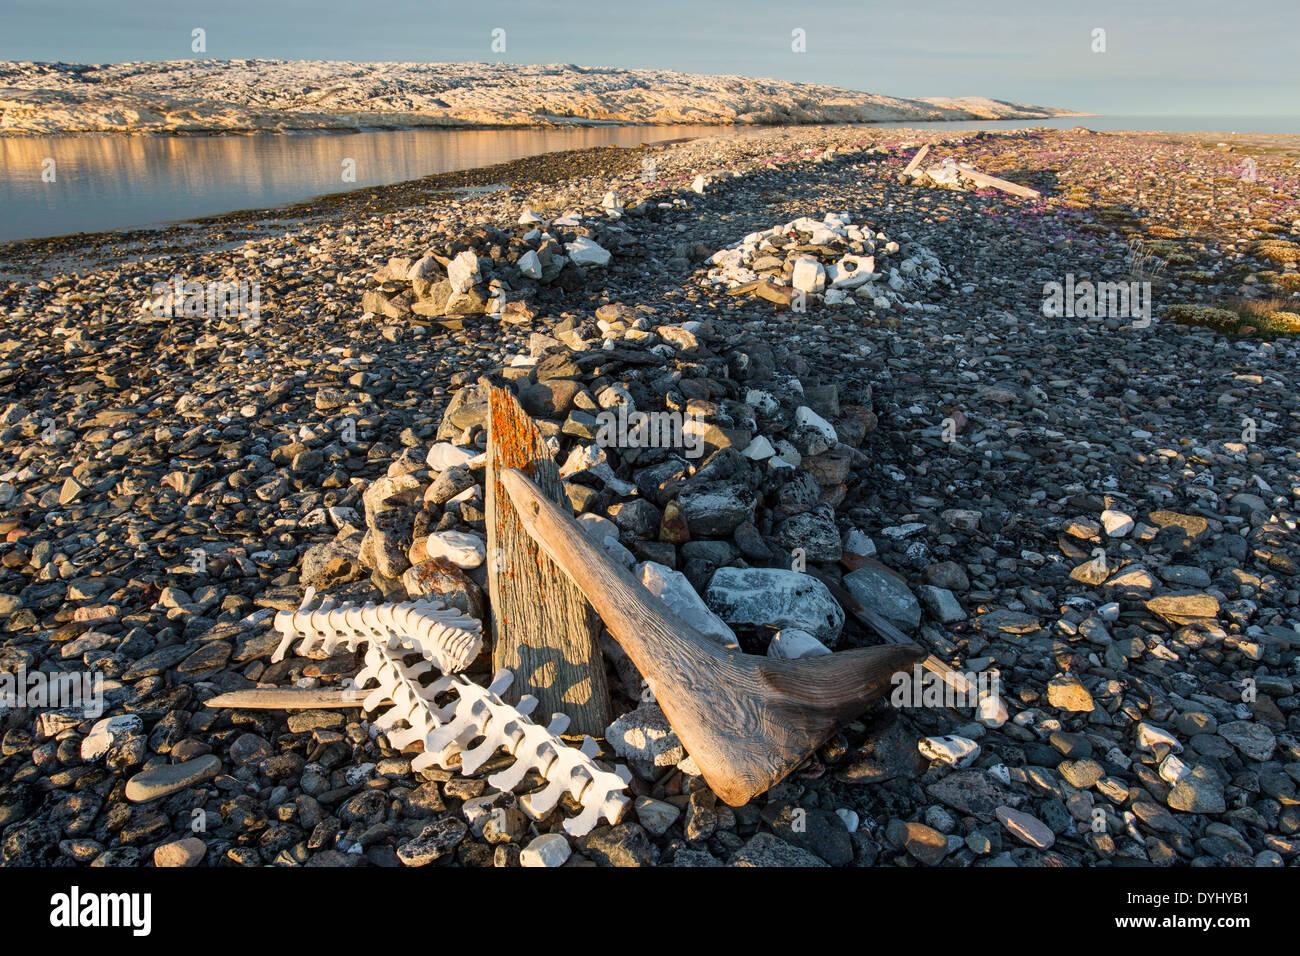 Canada, Nunavut Territory, Whaler's graves on Deadman Island along Hudson Bay - Stock Image